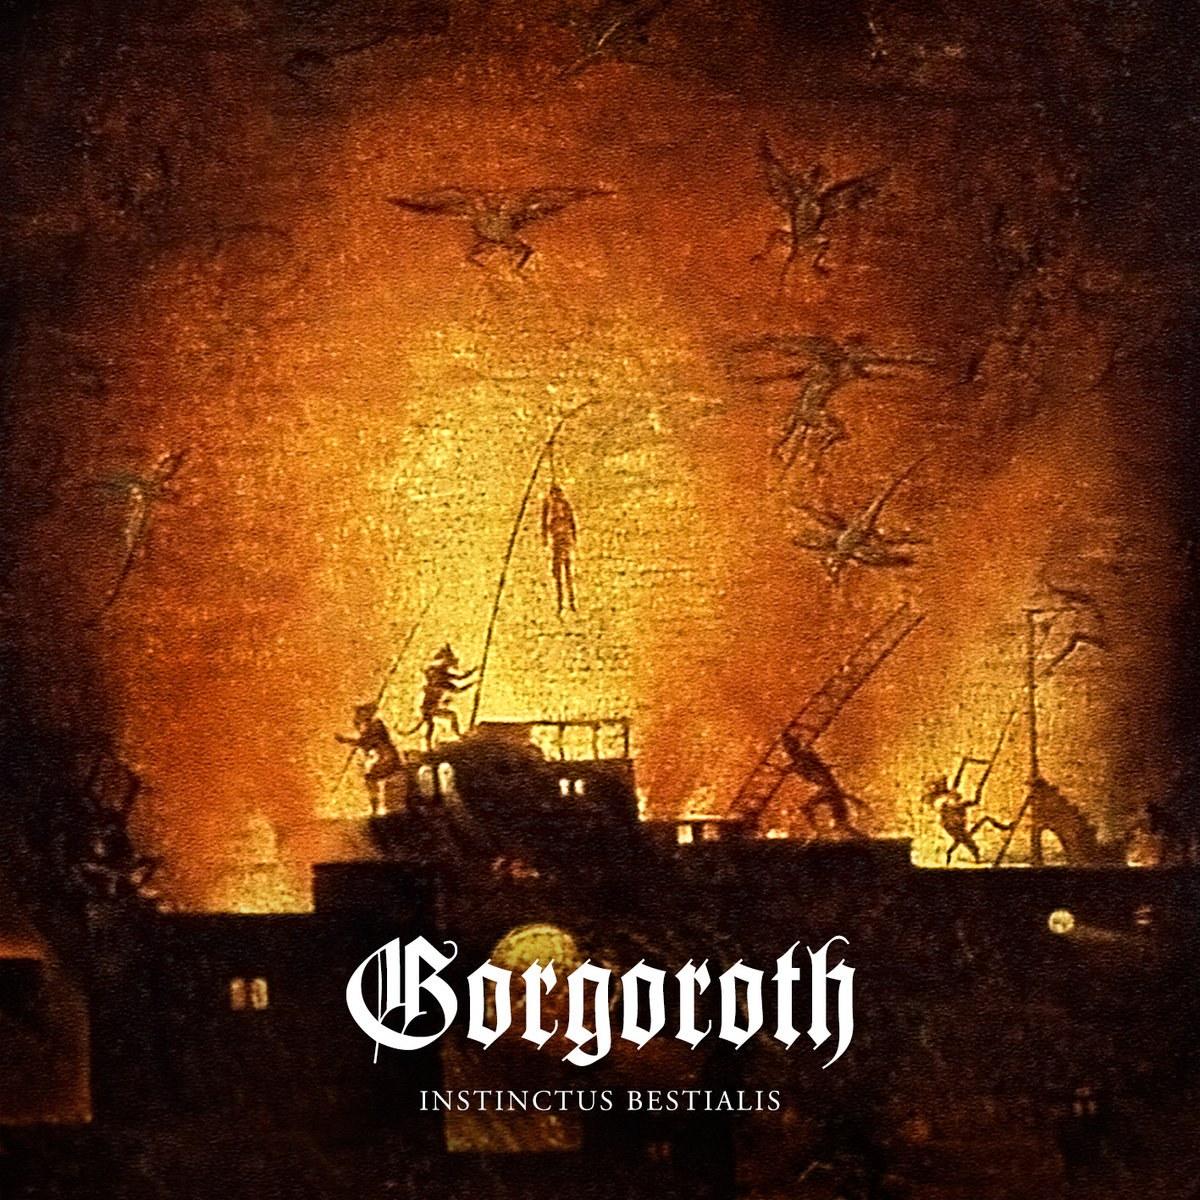 Review for Gorgoroth - Instinctus Bestialis